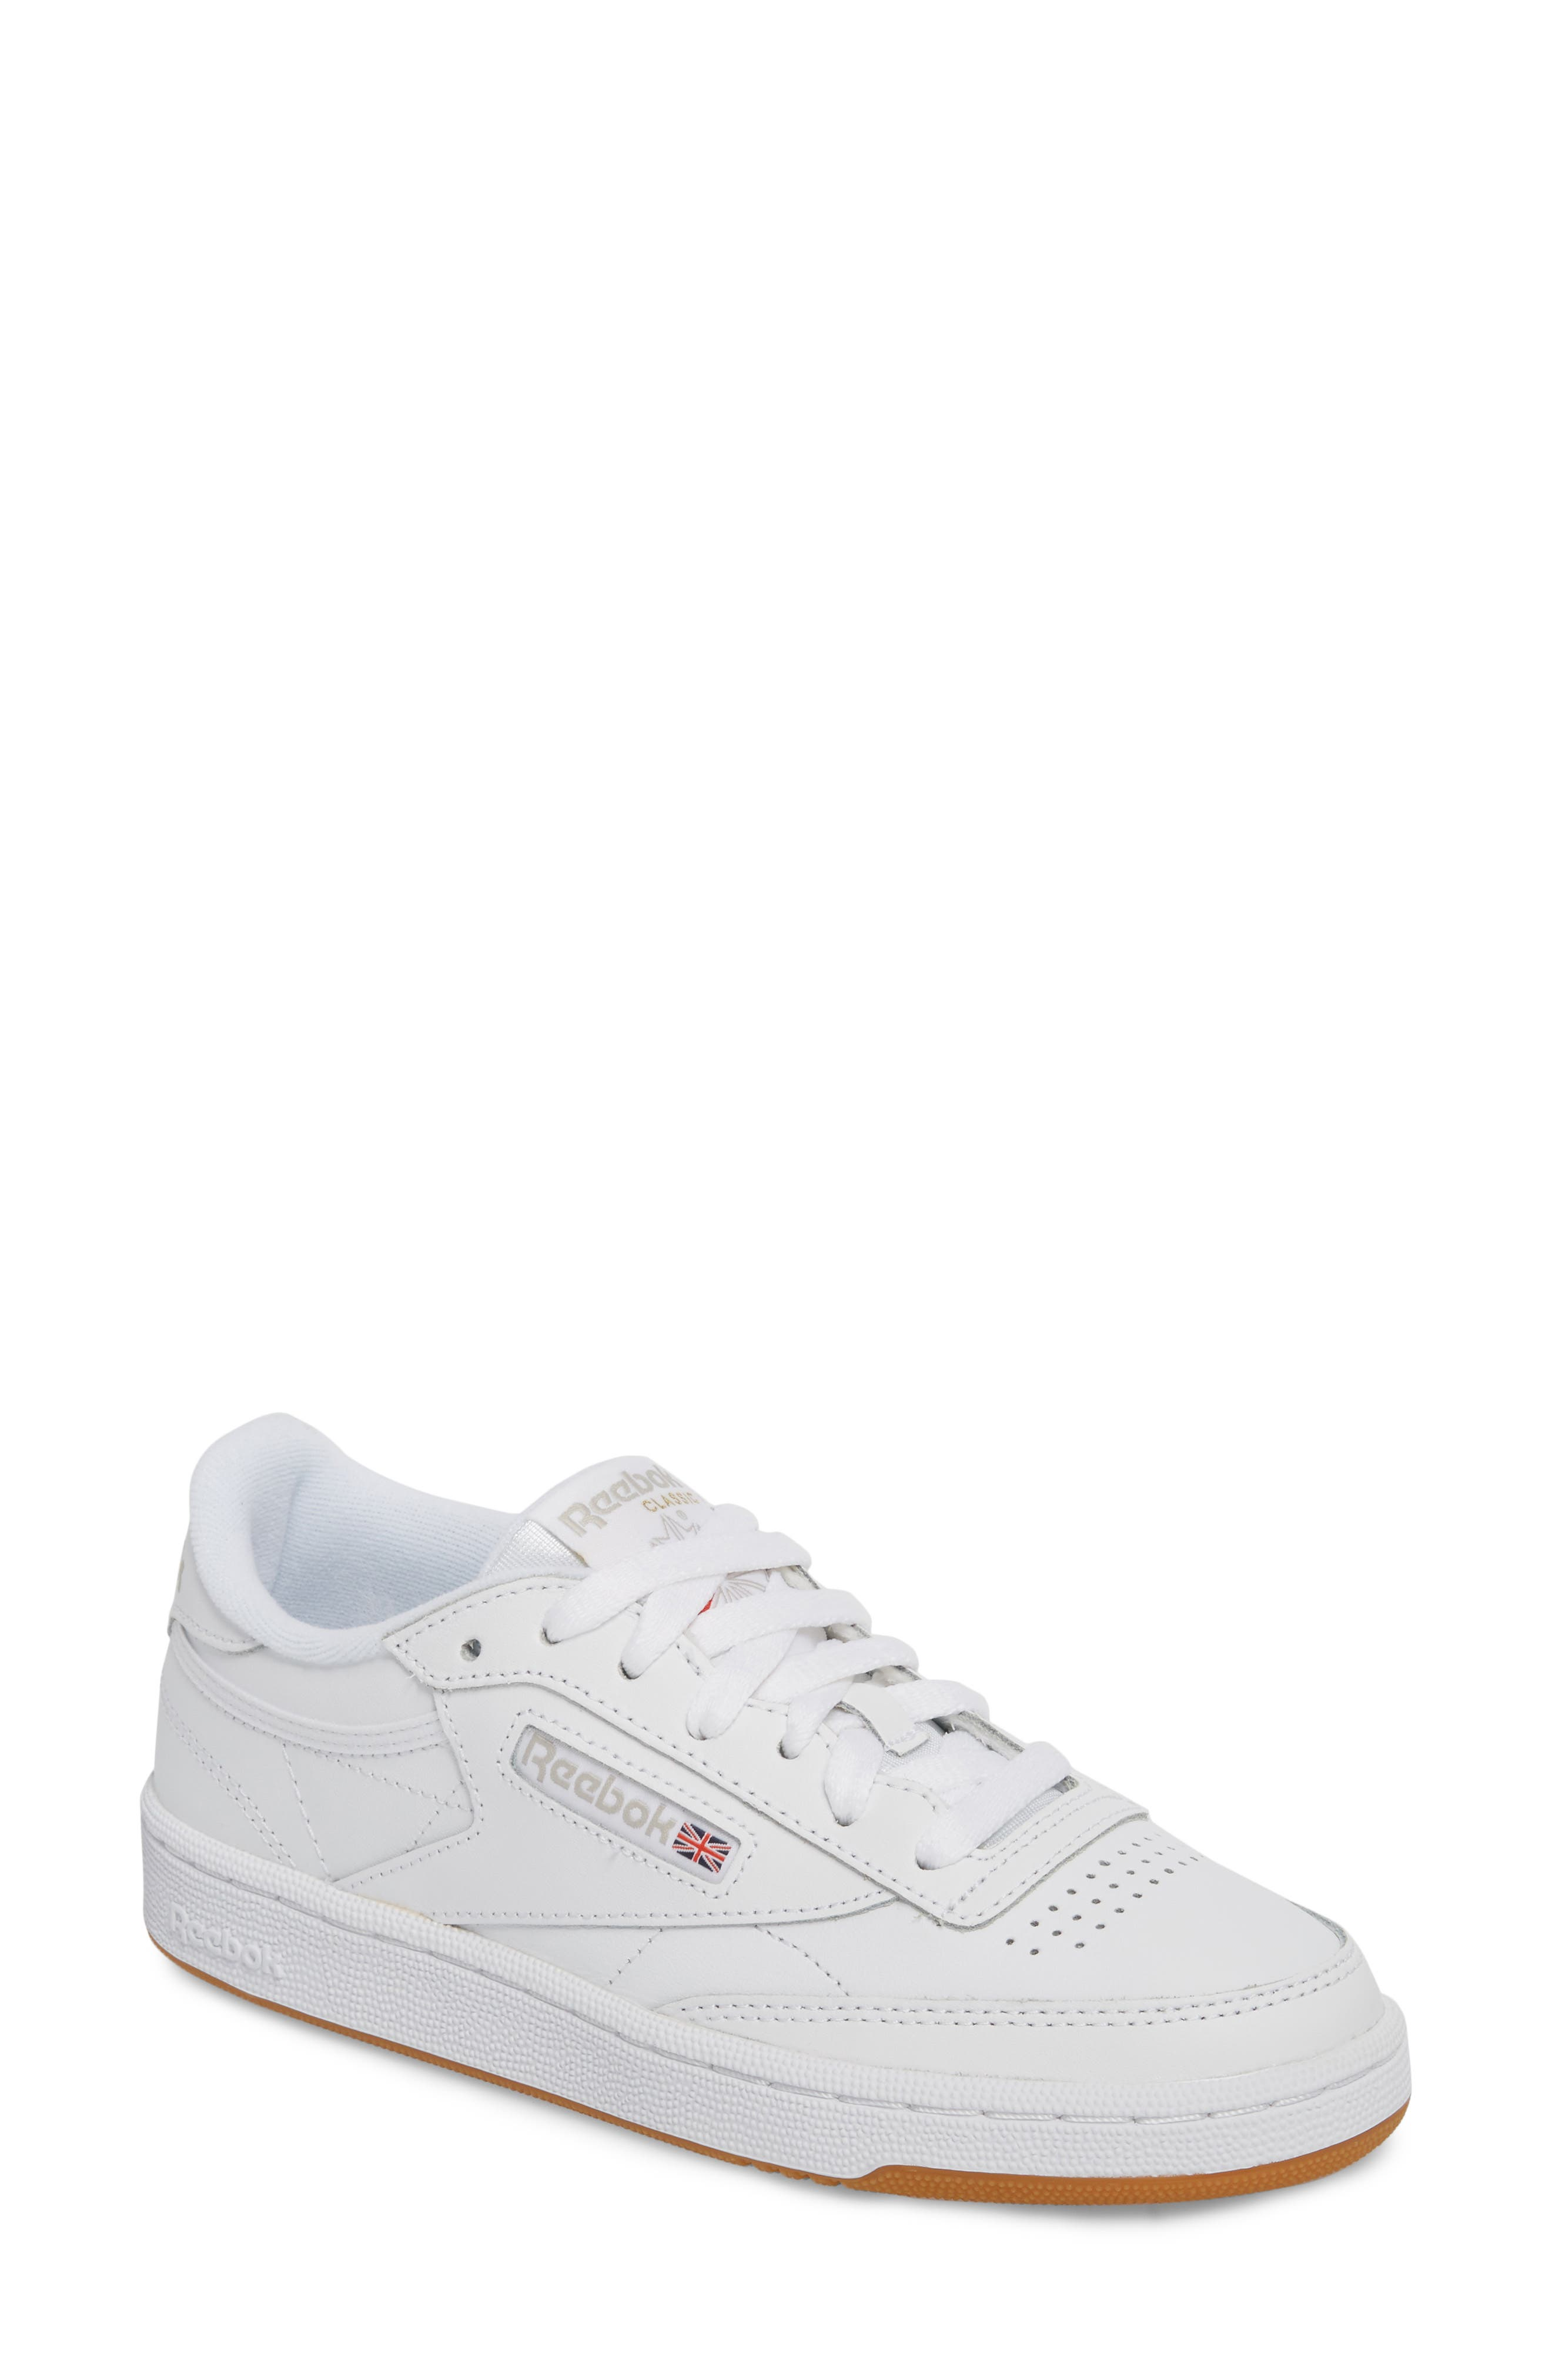 Club C 85 Sneaker, Main, color, WHITE/ LIGHT GREY/ GUM